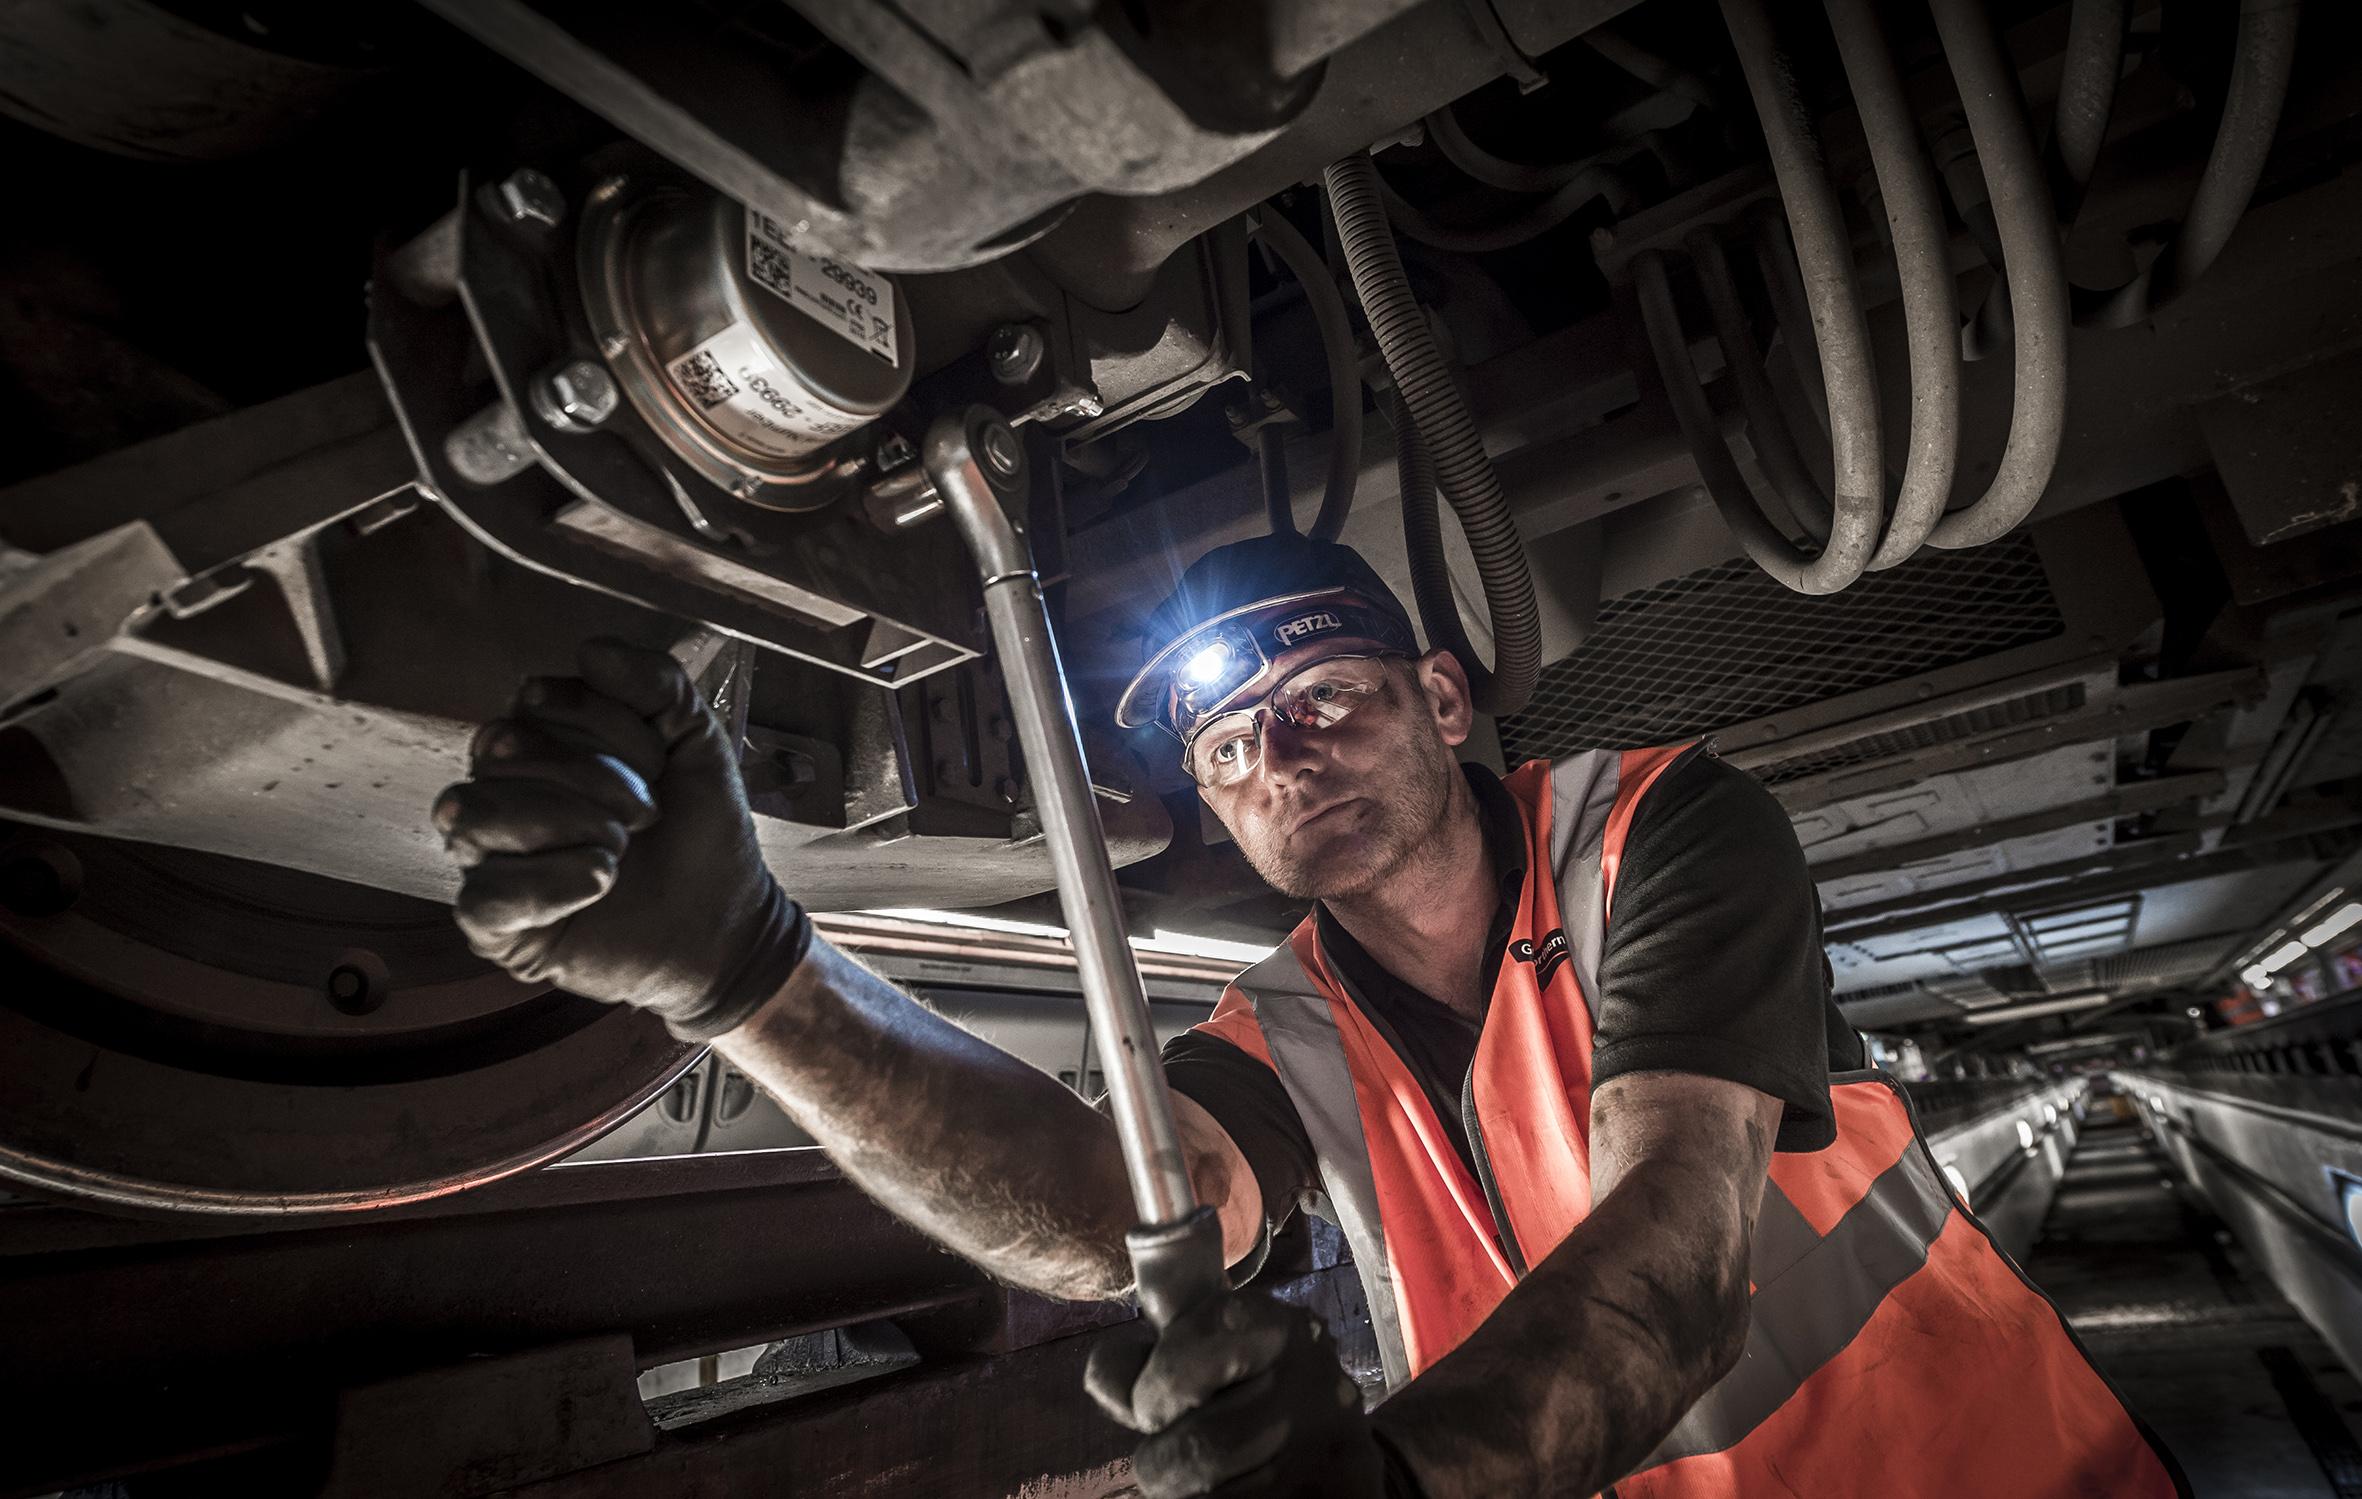 Fitting vibration sensors at Hornsey depot, North London